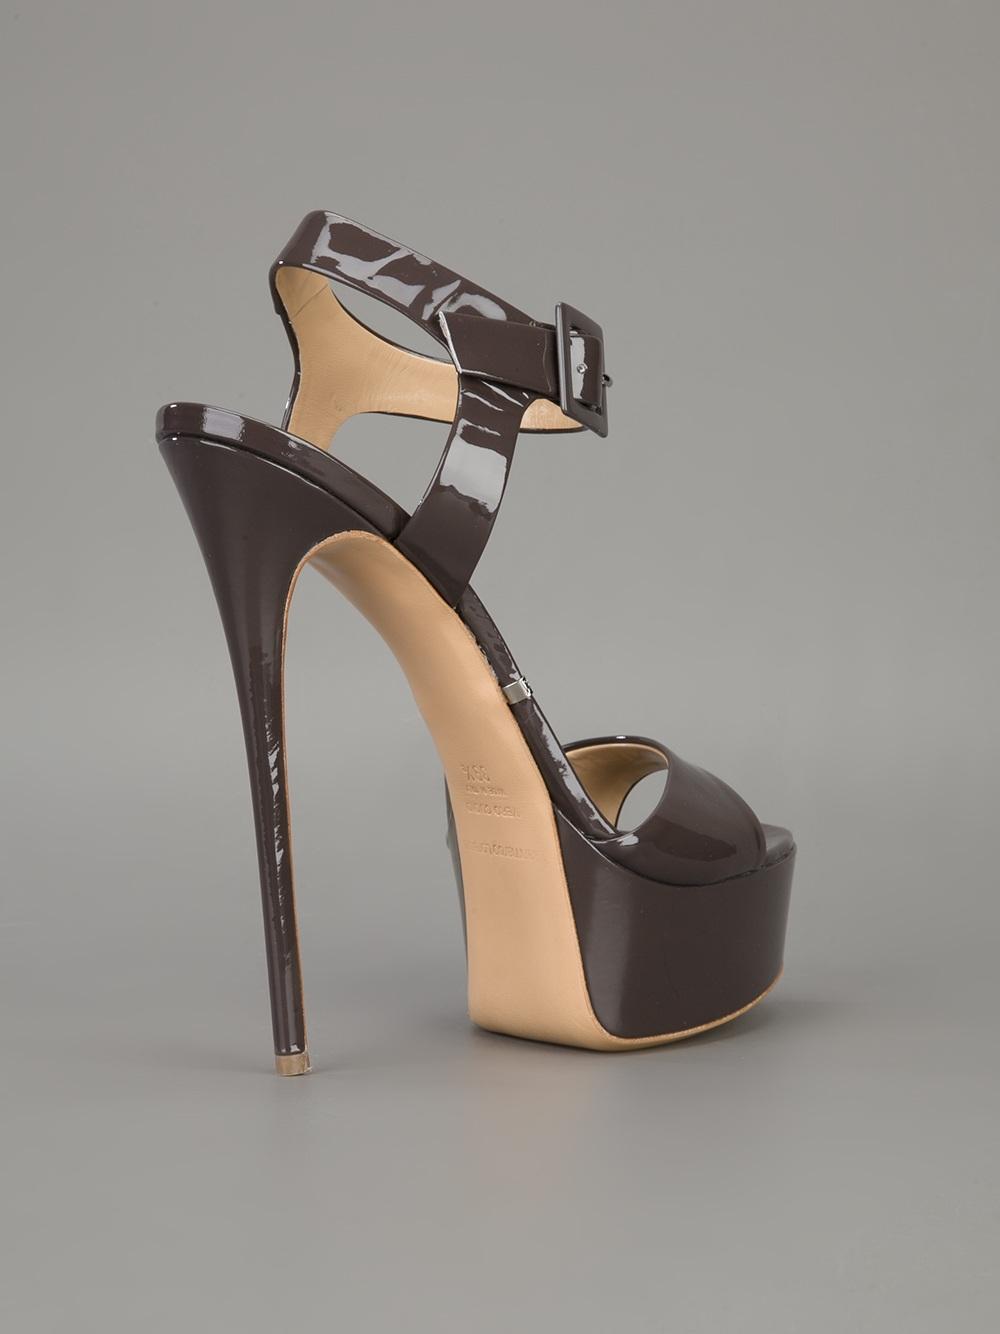 Lyst Gianmarco Lorenzi Platform Stiletto Sandal In Brown